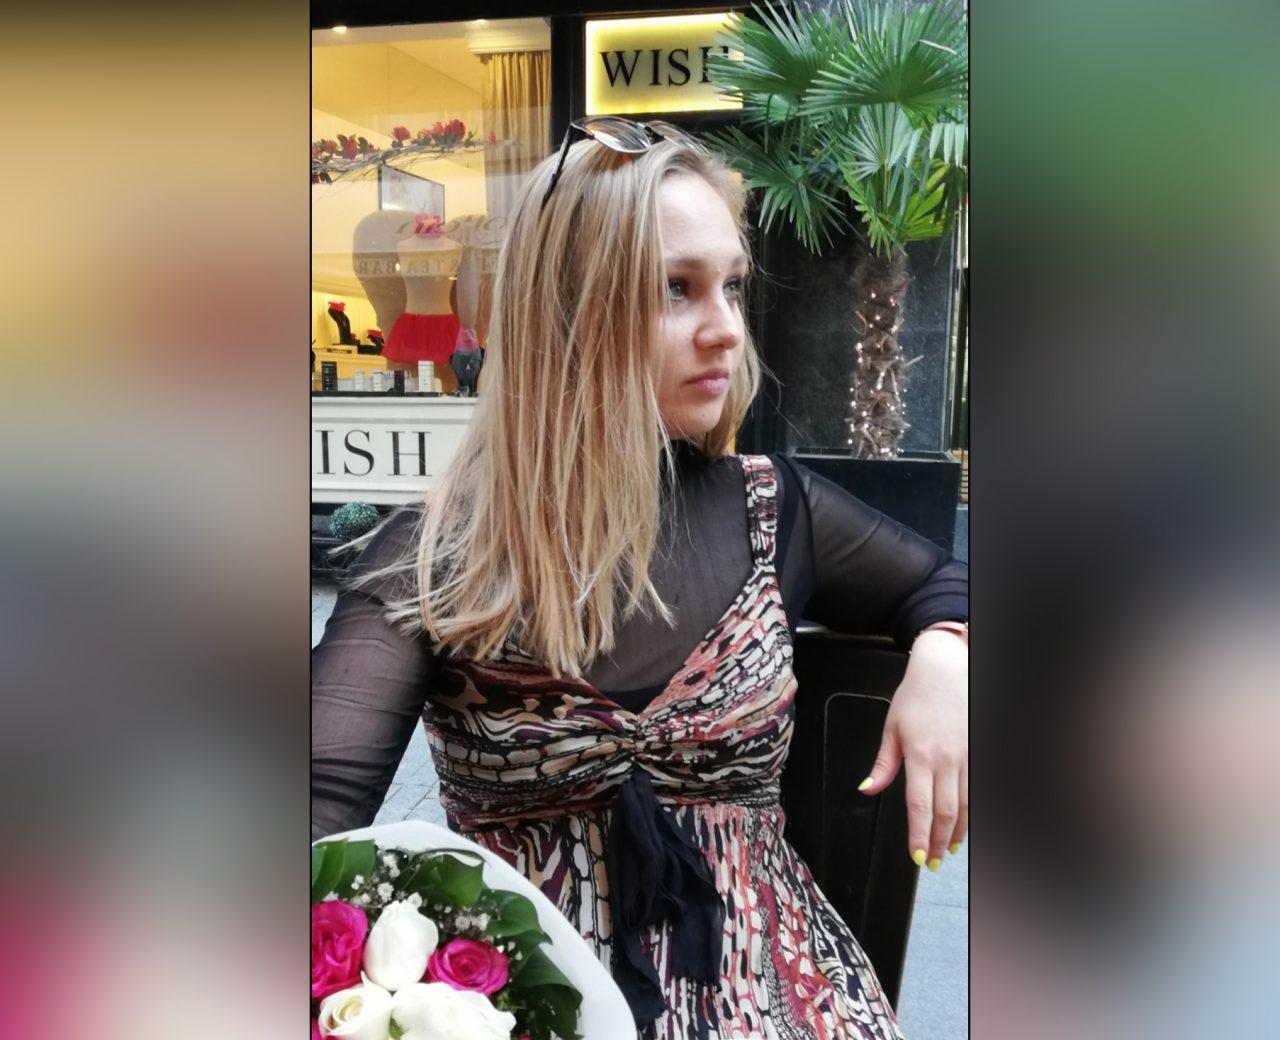 Teodora-Jovanovic-foto-privatna-arhiva-1280x1040.jpg